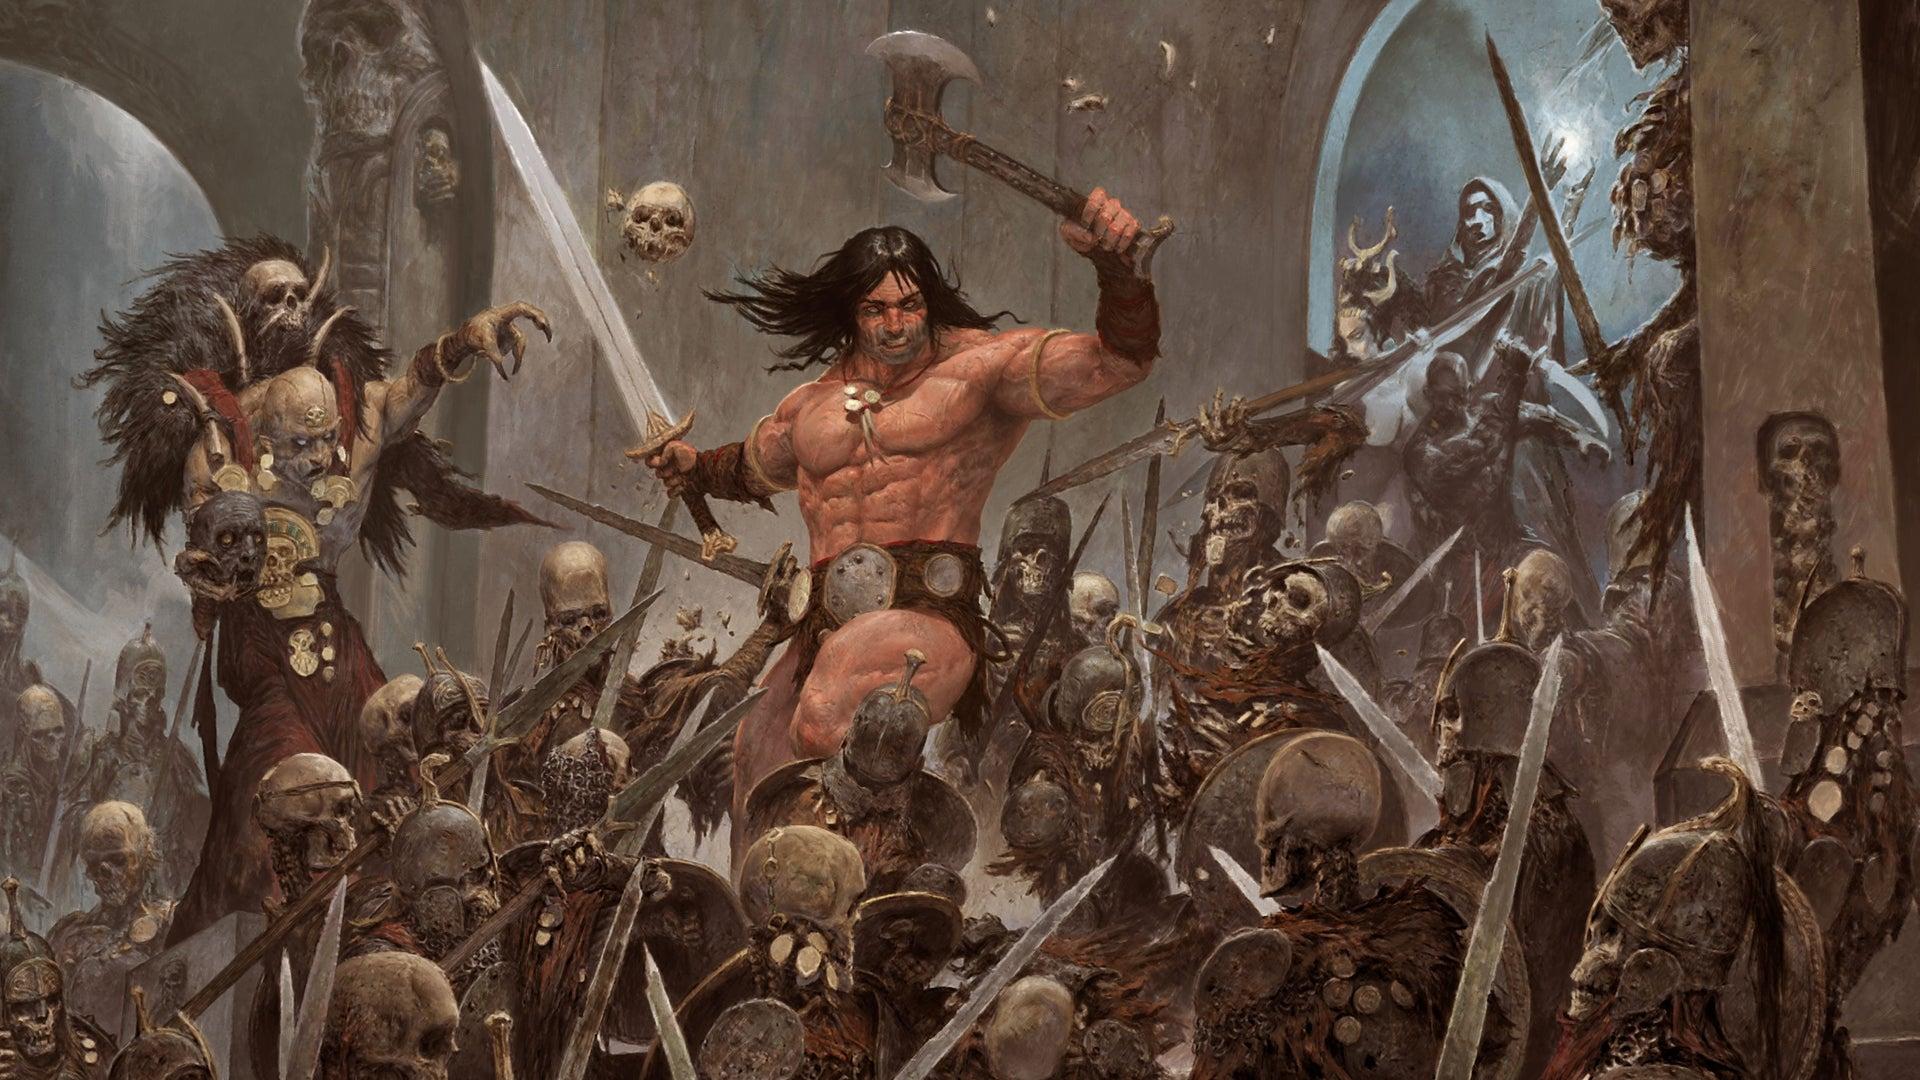 Conan board game artwork